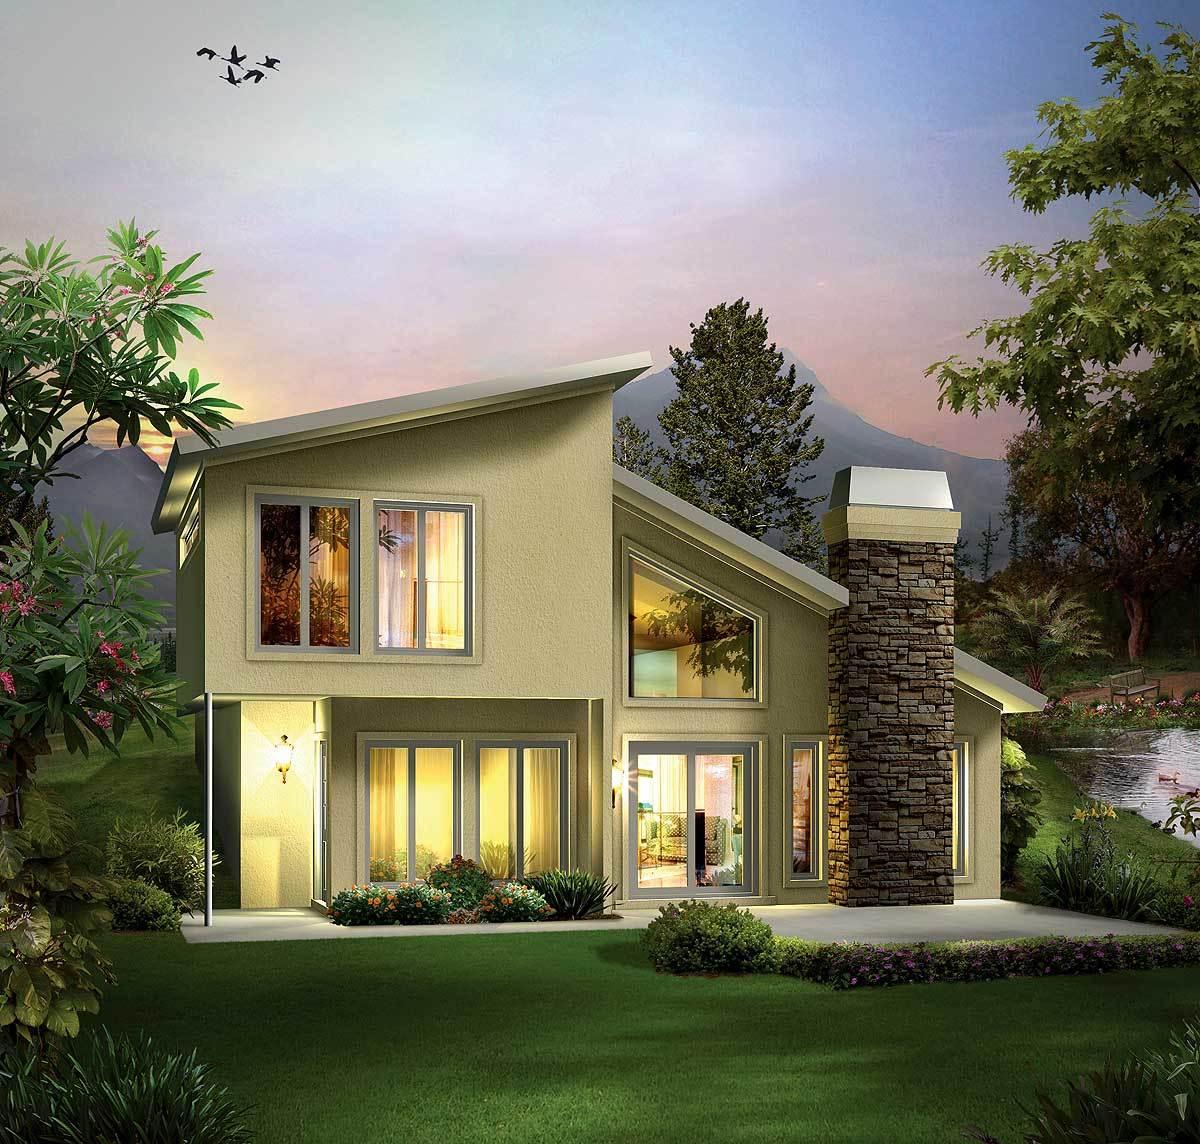 Berm Homes Advantages House House Plans: Earth-Sheltered Berm Home Plan - 57264HA